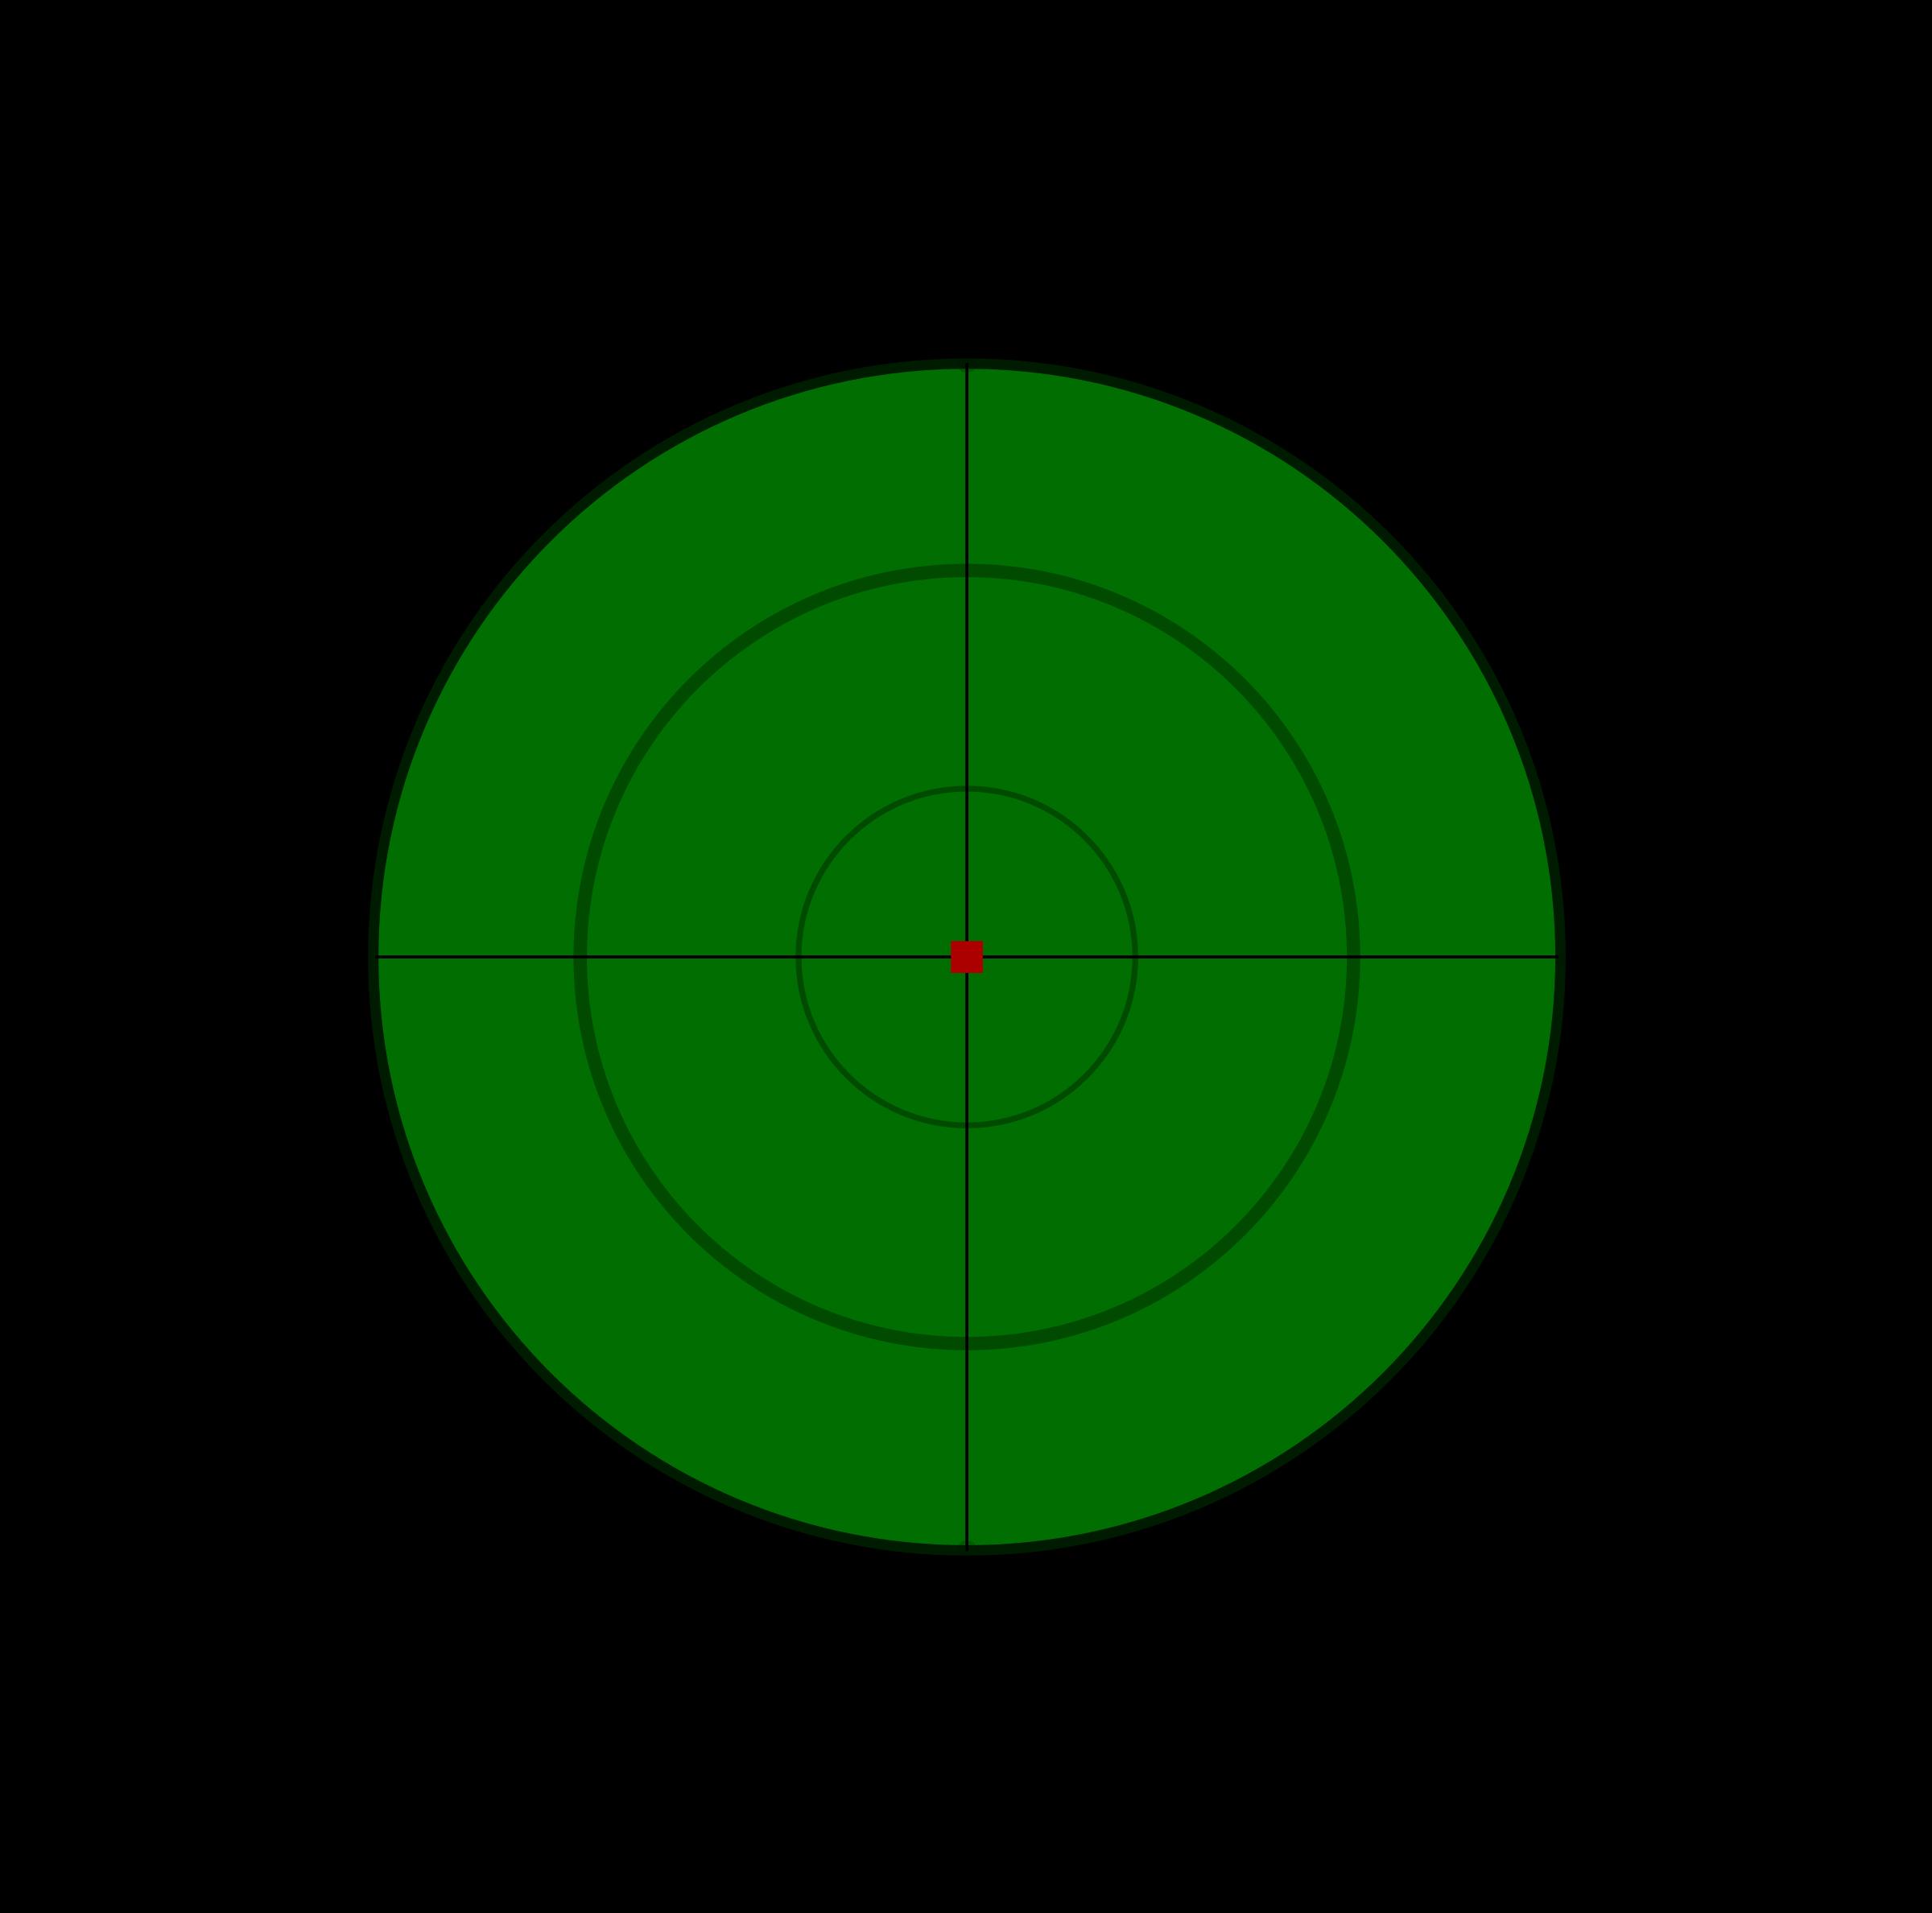 Sniper target Clipart Sniper target